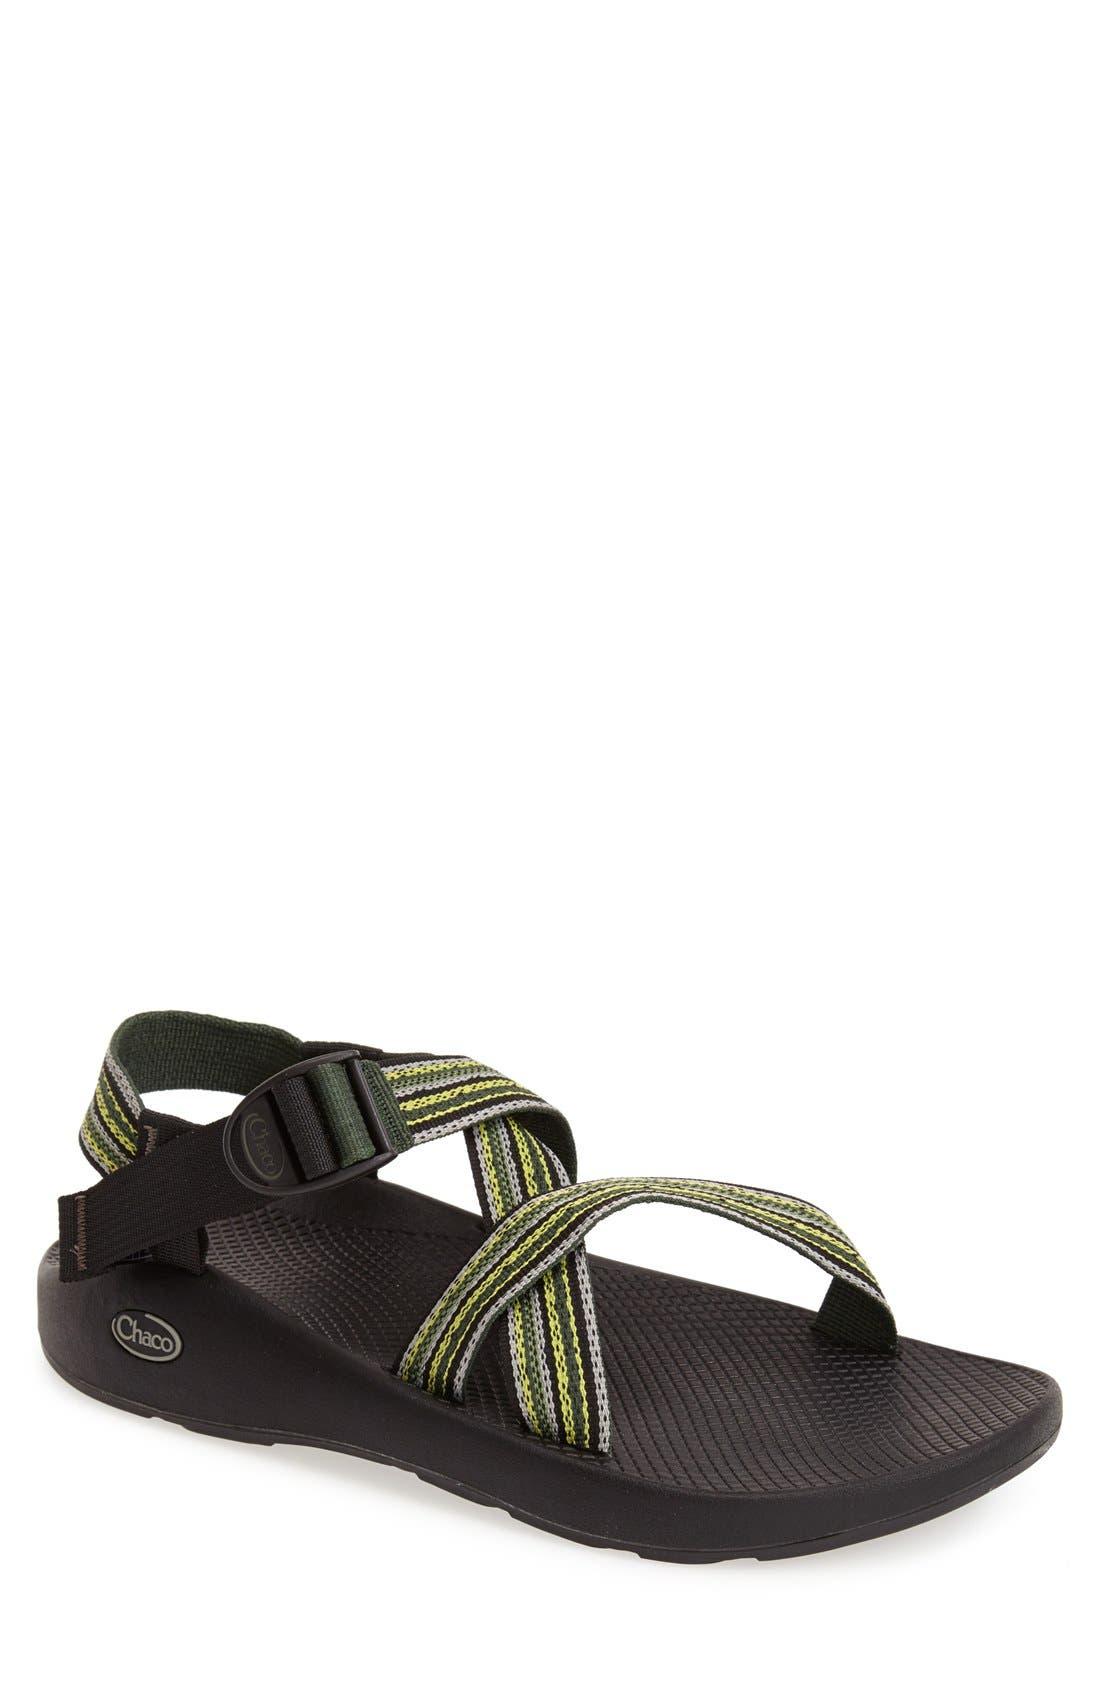 Alternate Image 1 Selected - Chaco 'Z/1 Yampa' Sandal (Men)